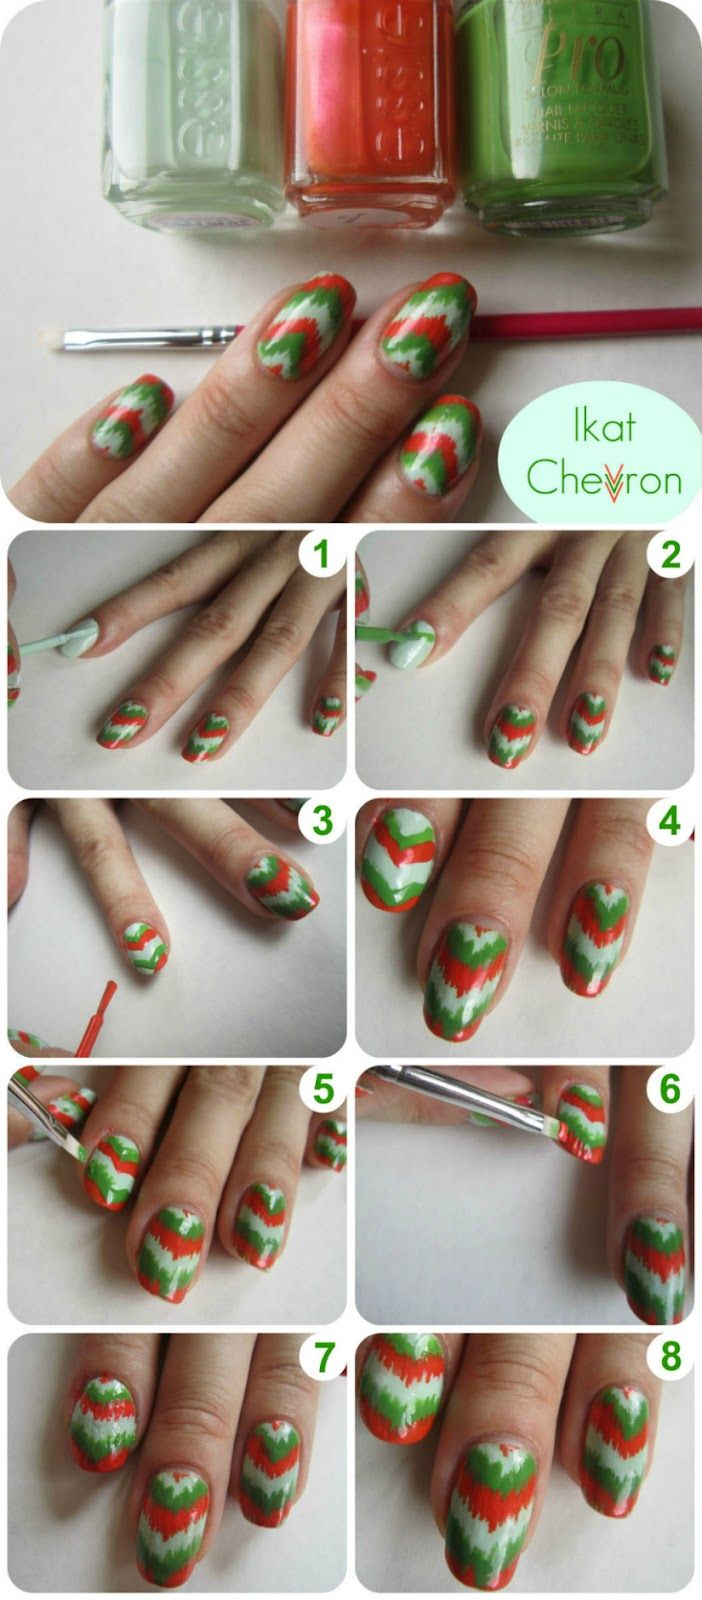 Chevron nail tutorial. Ikat style.: Ikat Chevron, Chevron Nail Tutorials, Nail Polish, Nailart, Style, Nailpolish, Nail Design, Nail Art, Chevron Nails